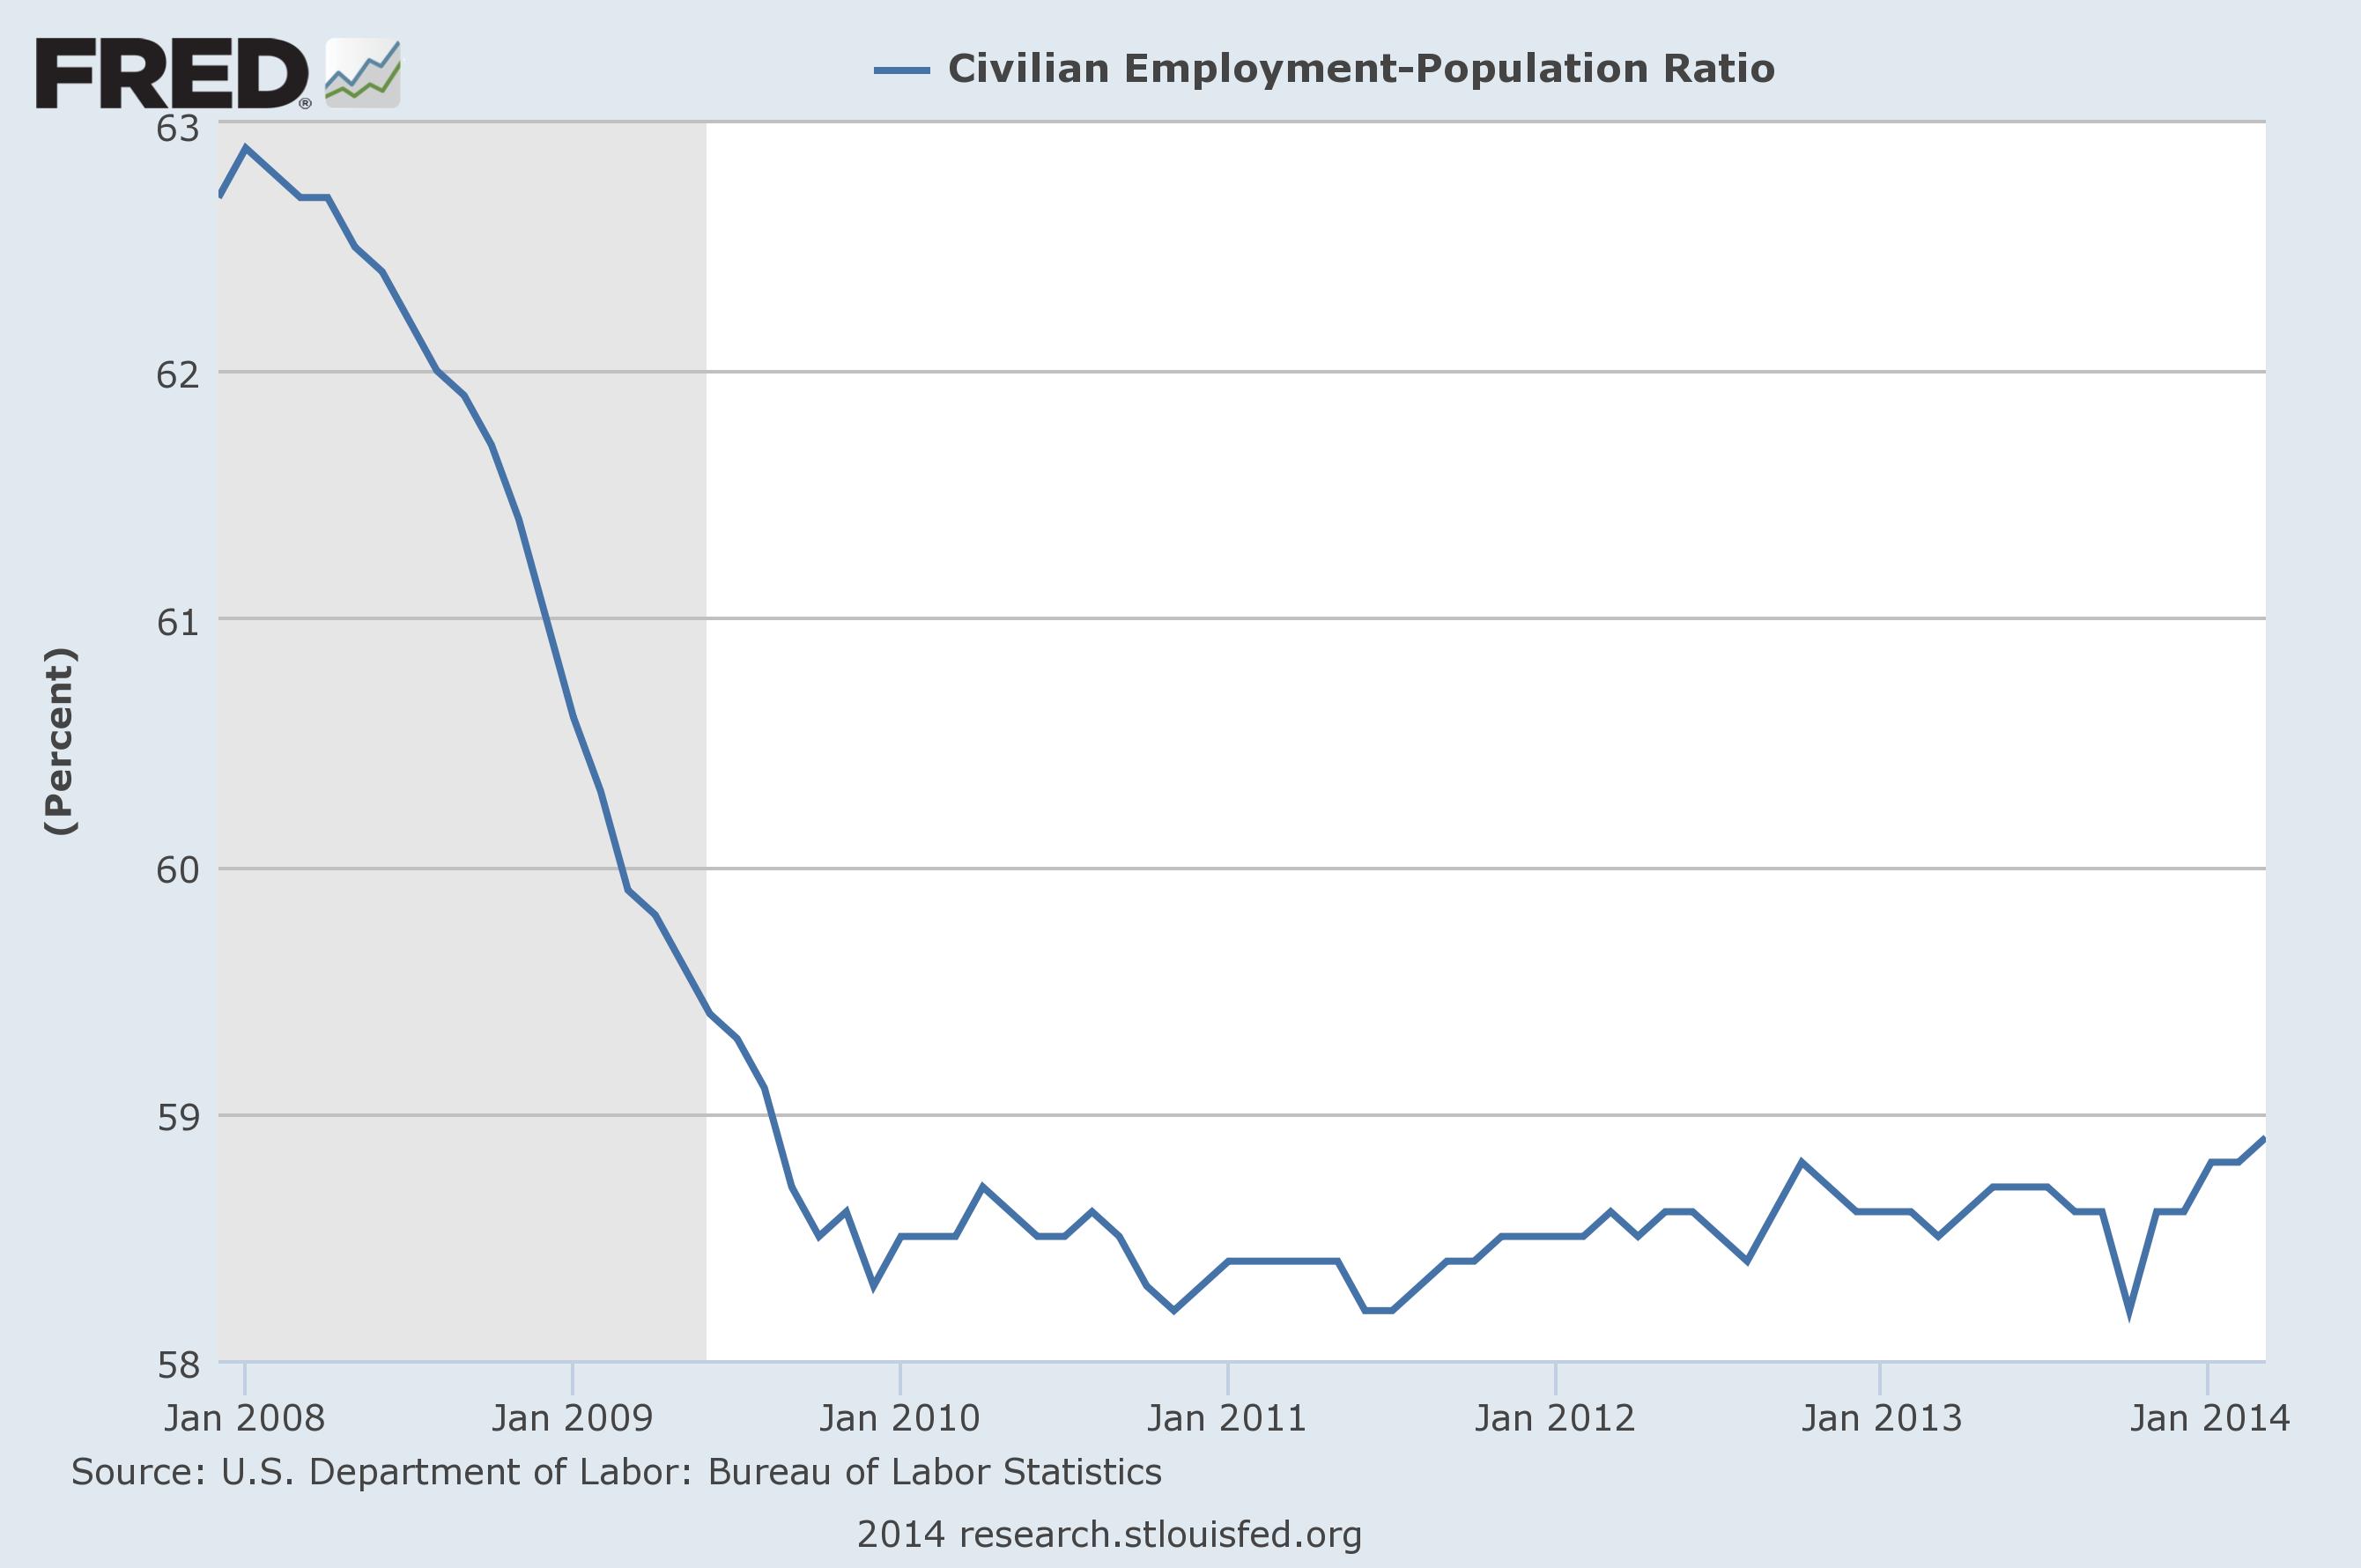 Employment-Population Ratio Still Below Pre-Recession Levels